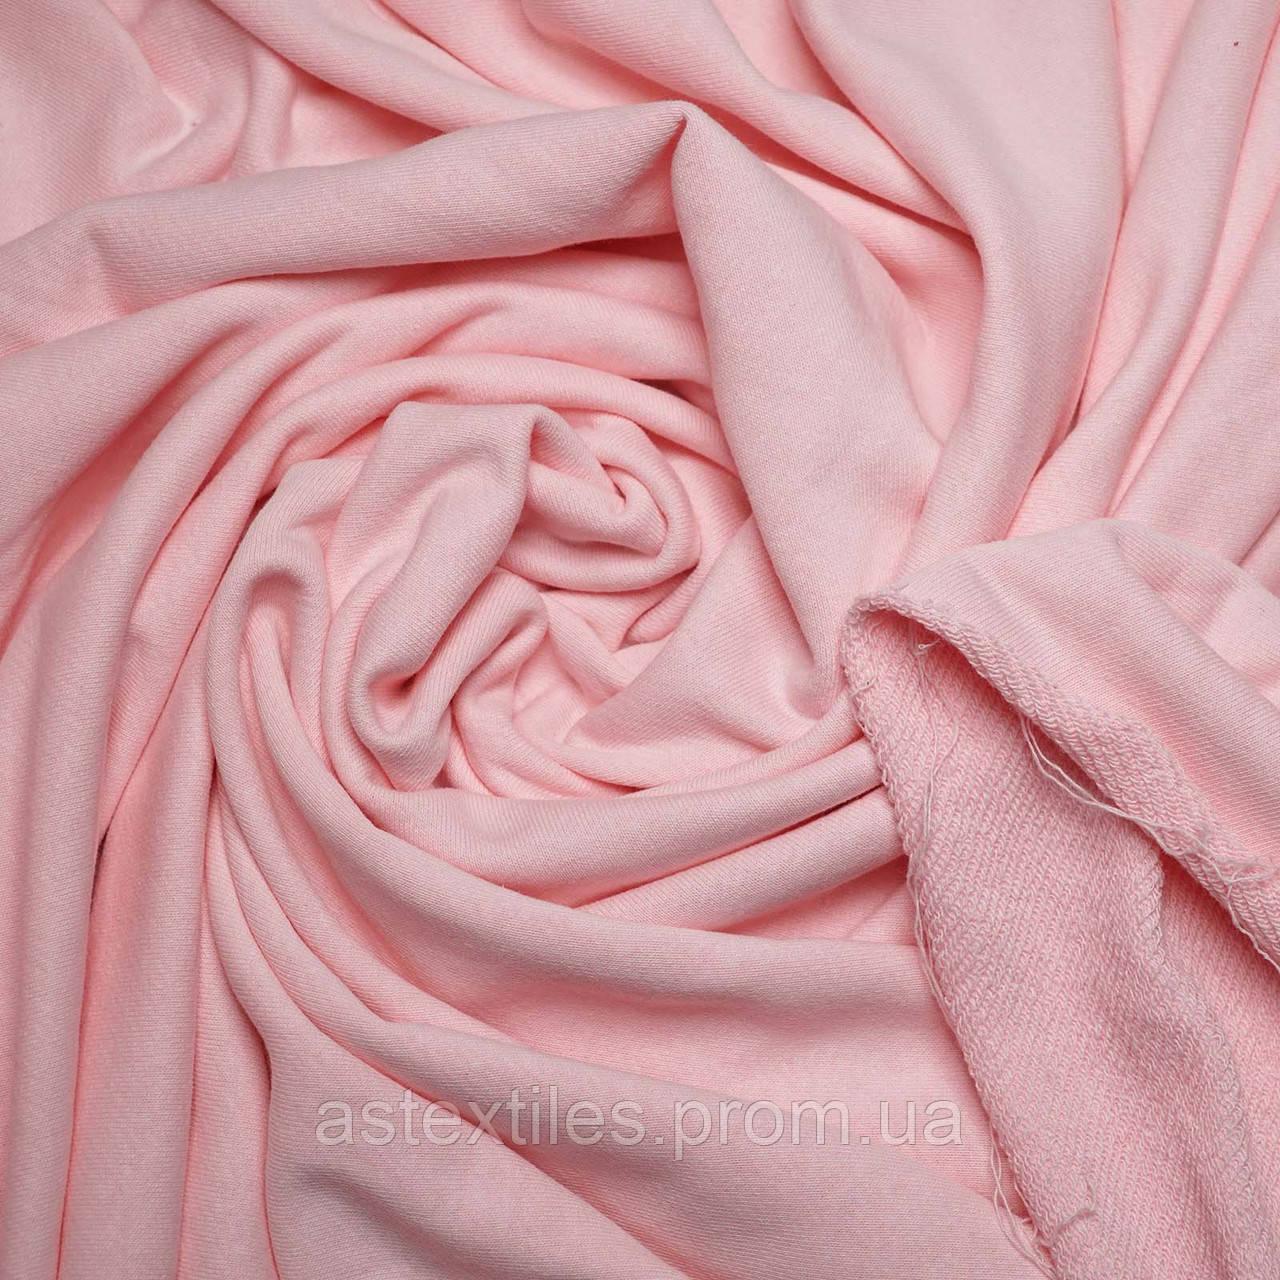 Трёхнитка петля Турция (розовая)